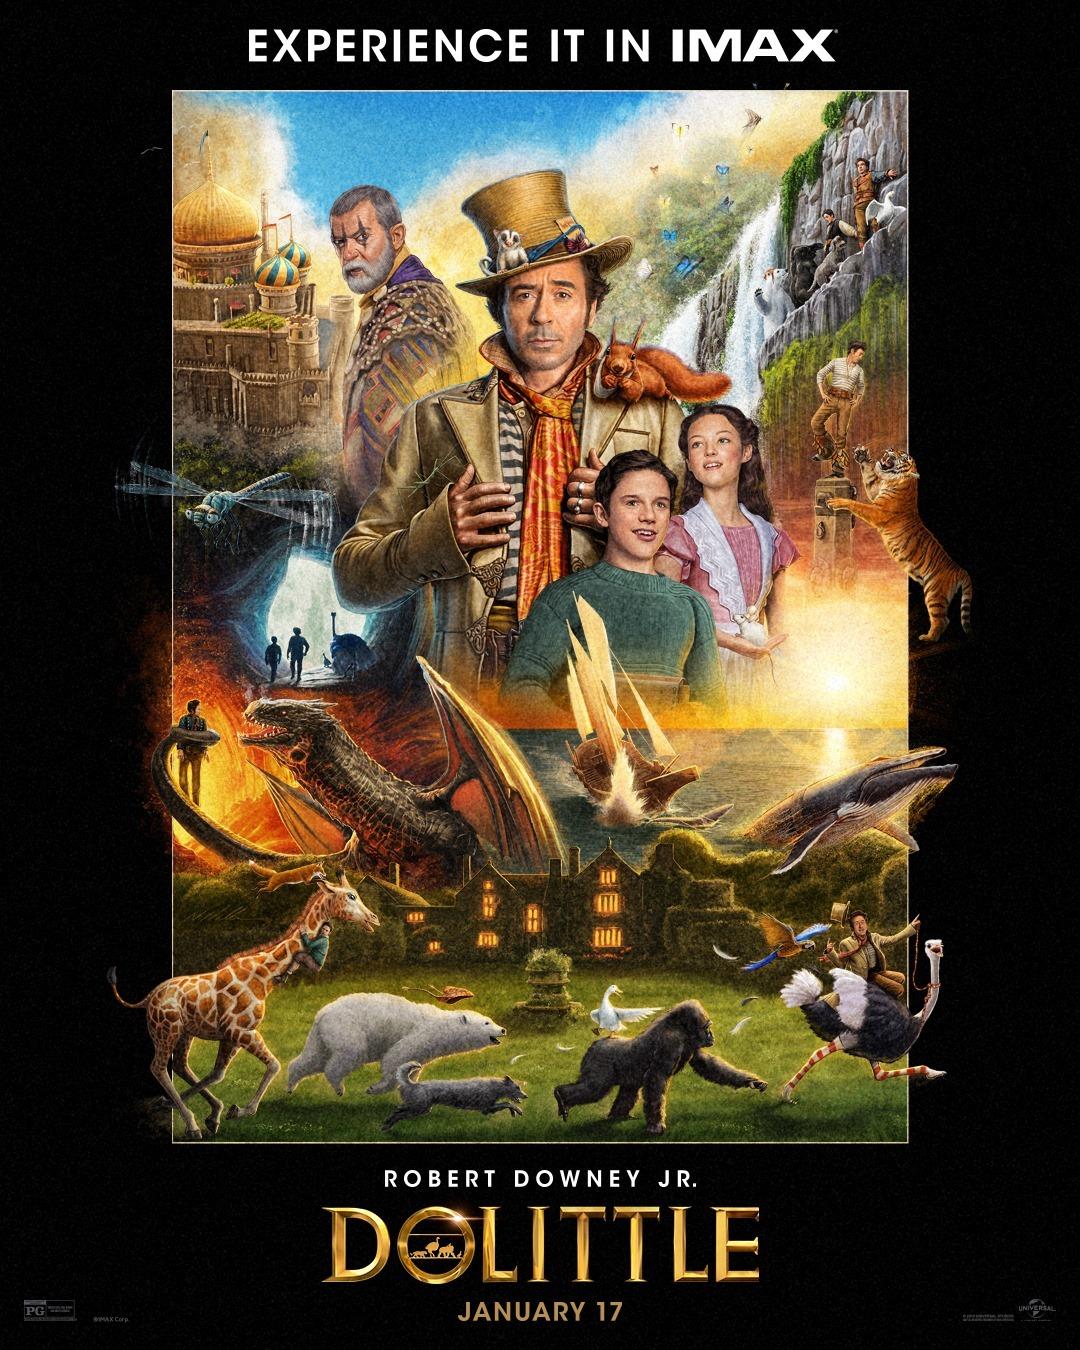 Póster IMAX de Dolittle (2020). Imagen: impawards.com